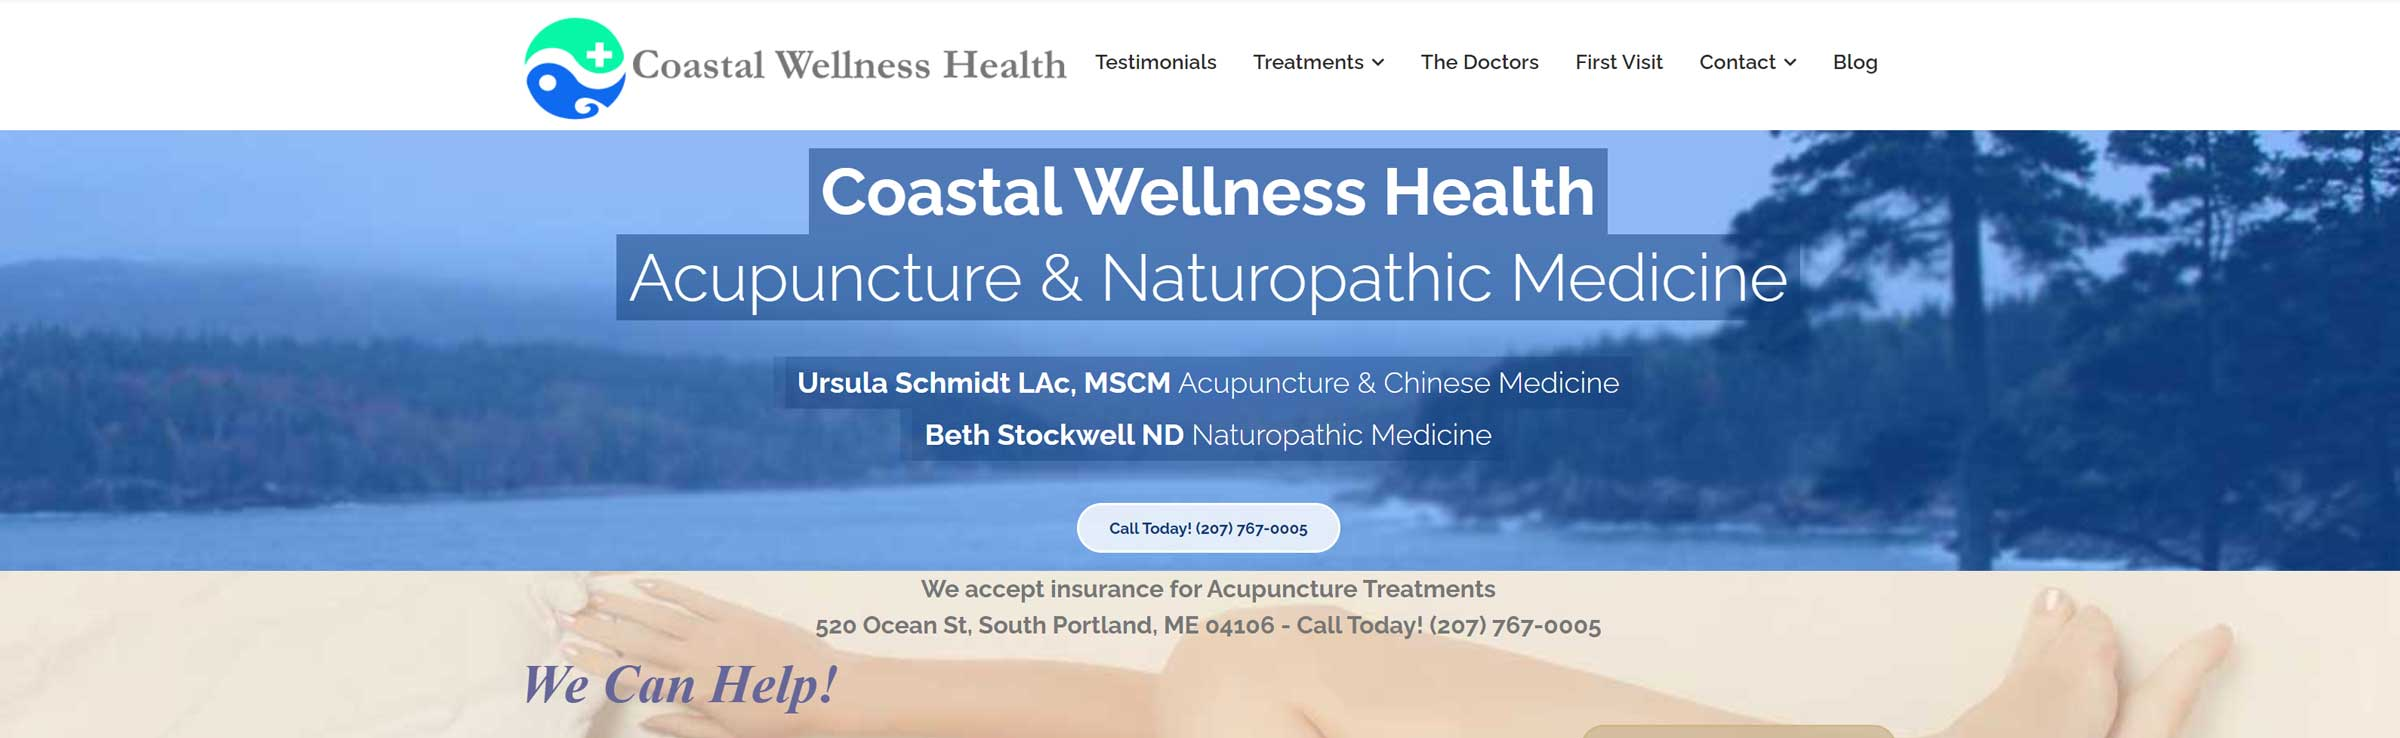 Coastal Wellness Health banner